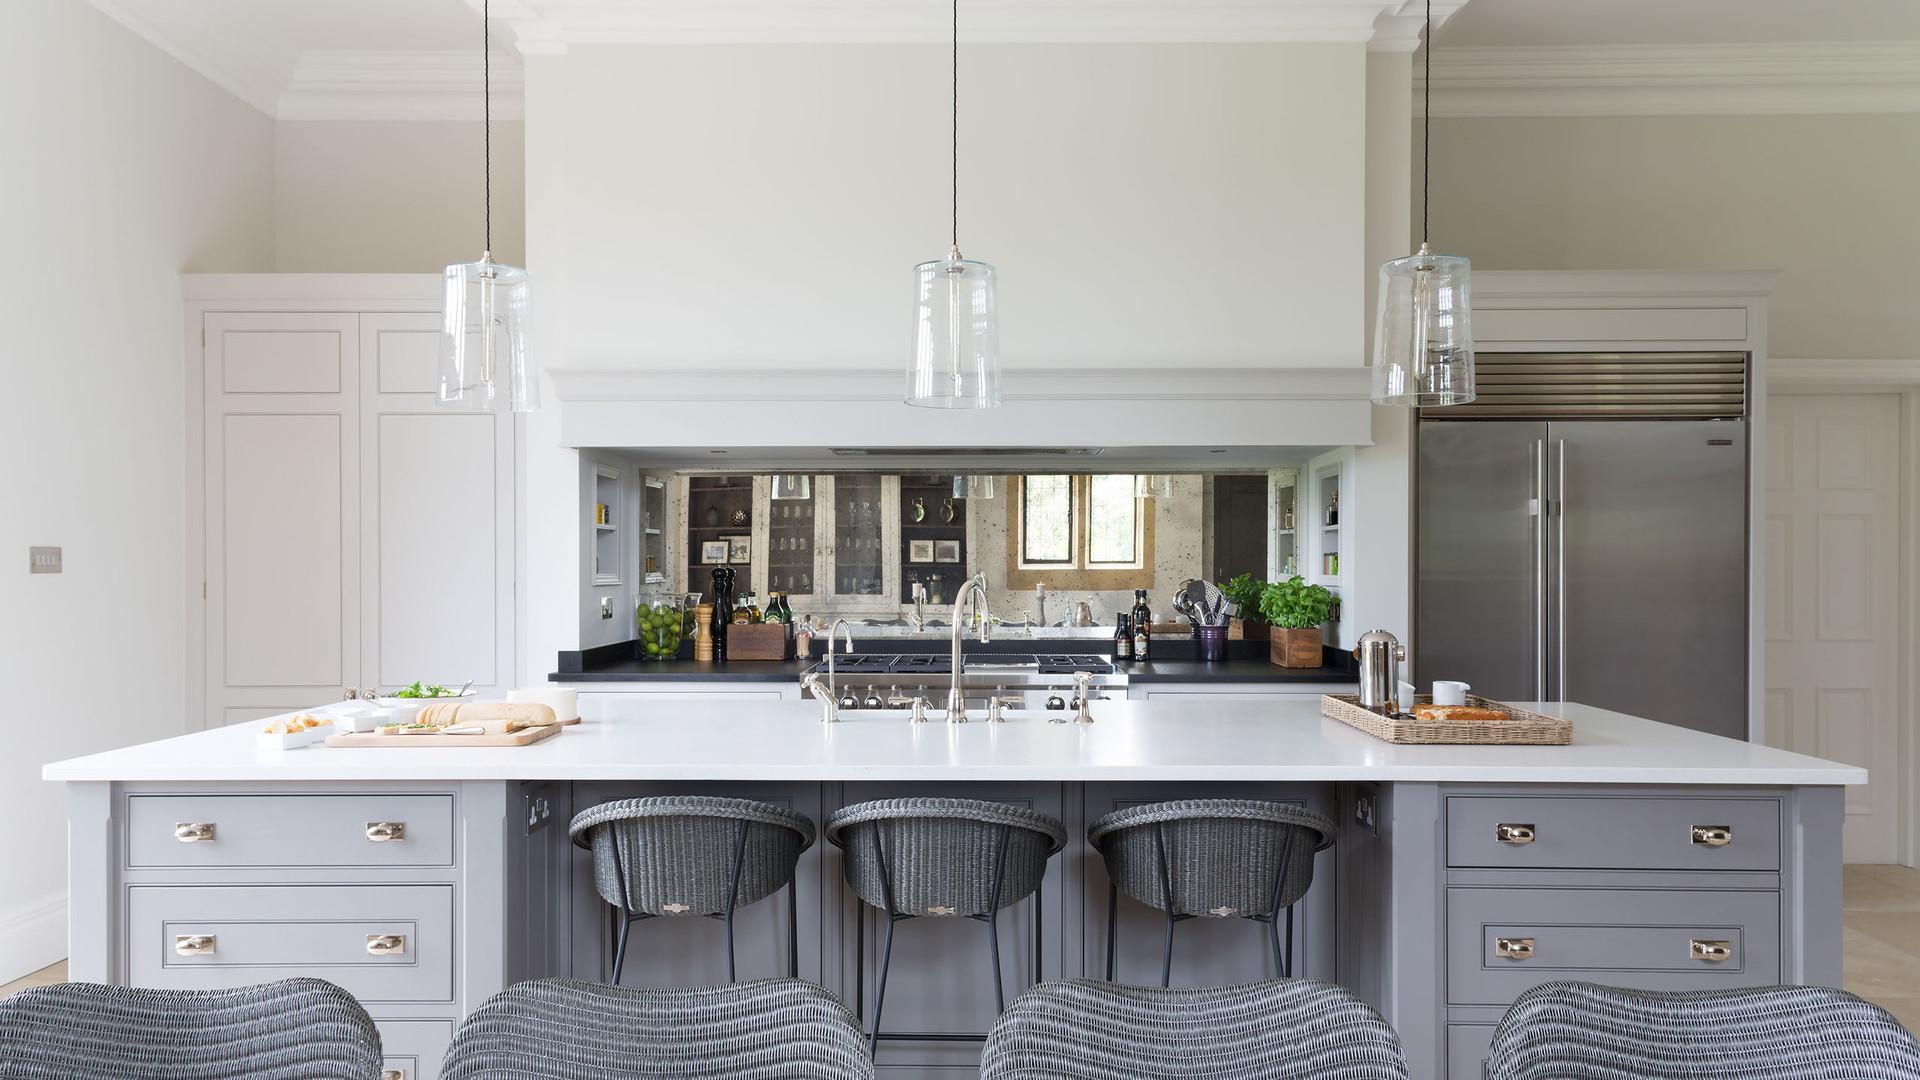 Knightsbridge Design - Interior 21